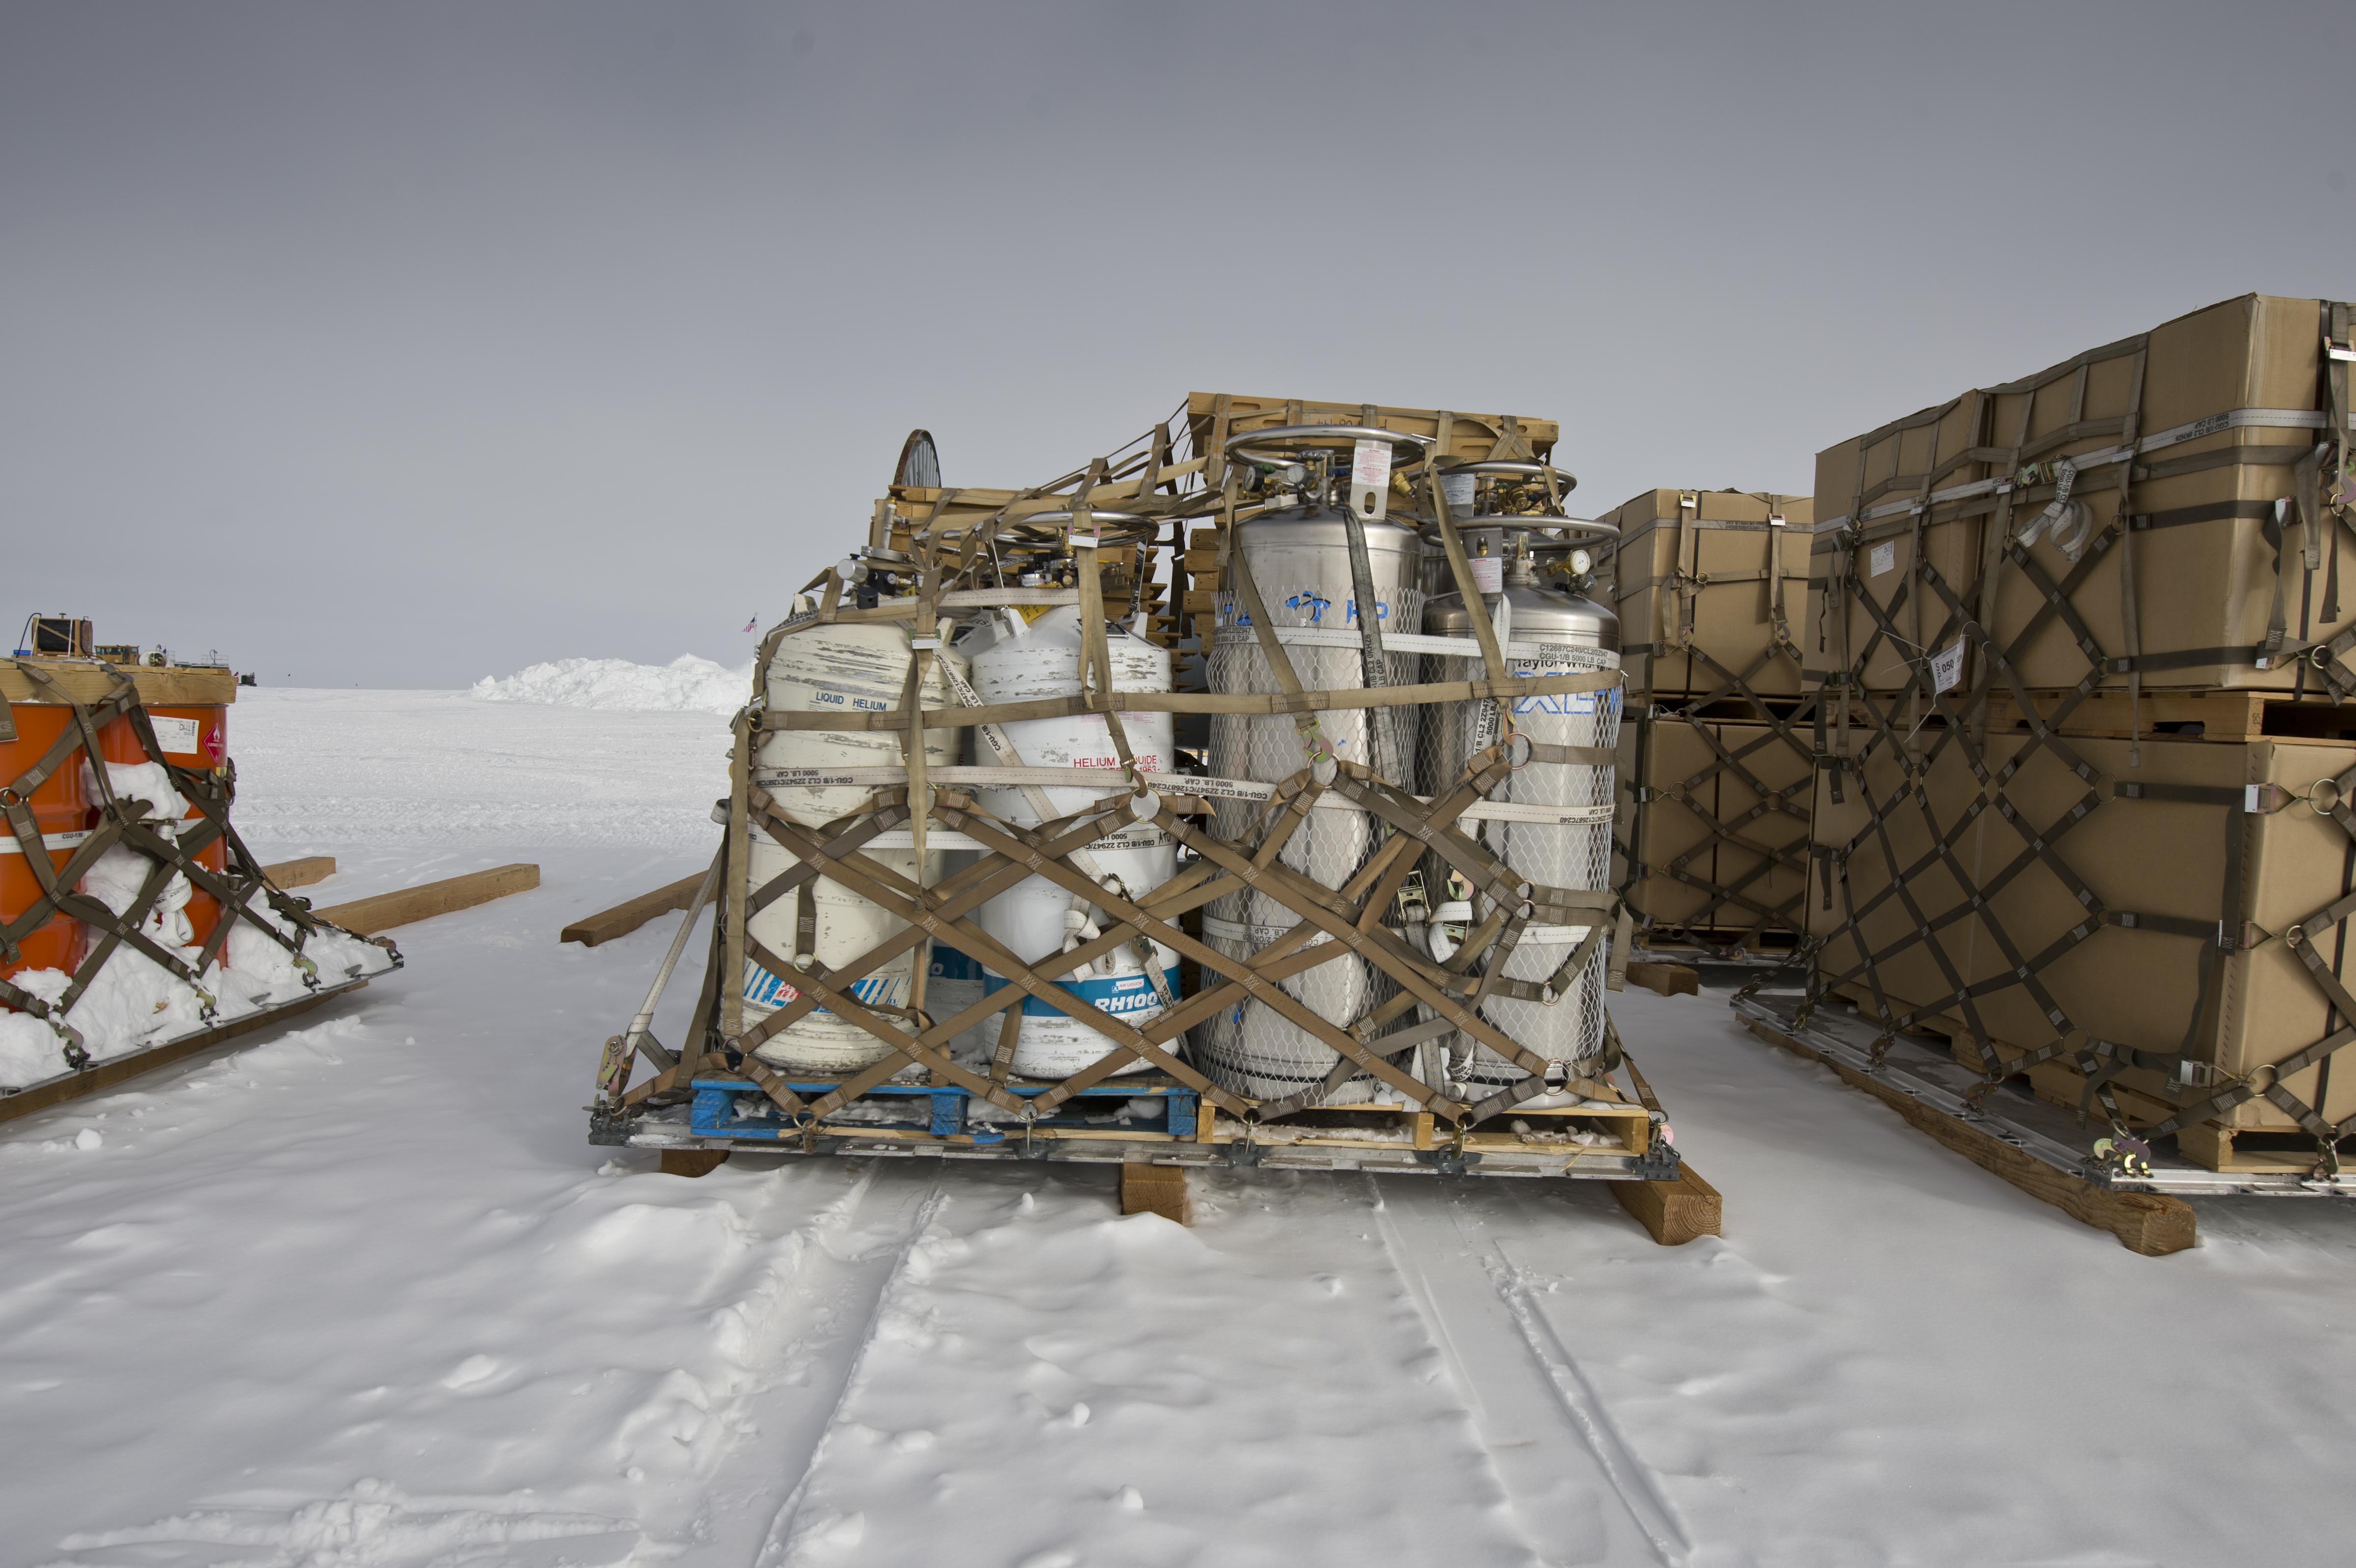 South Pole Cargo